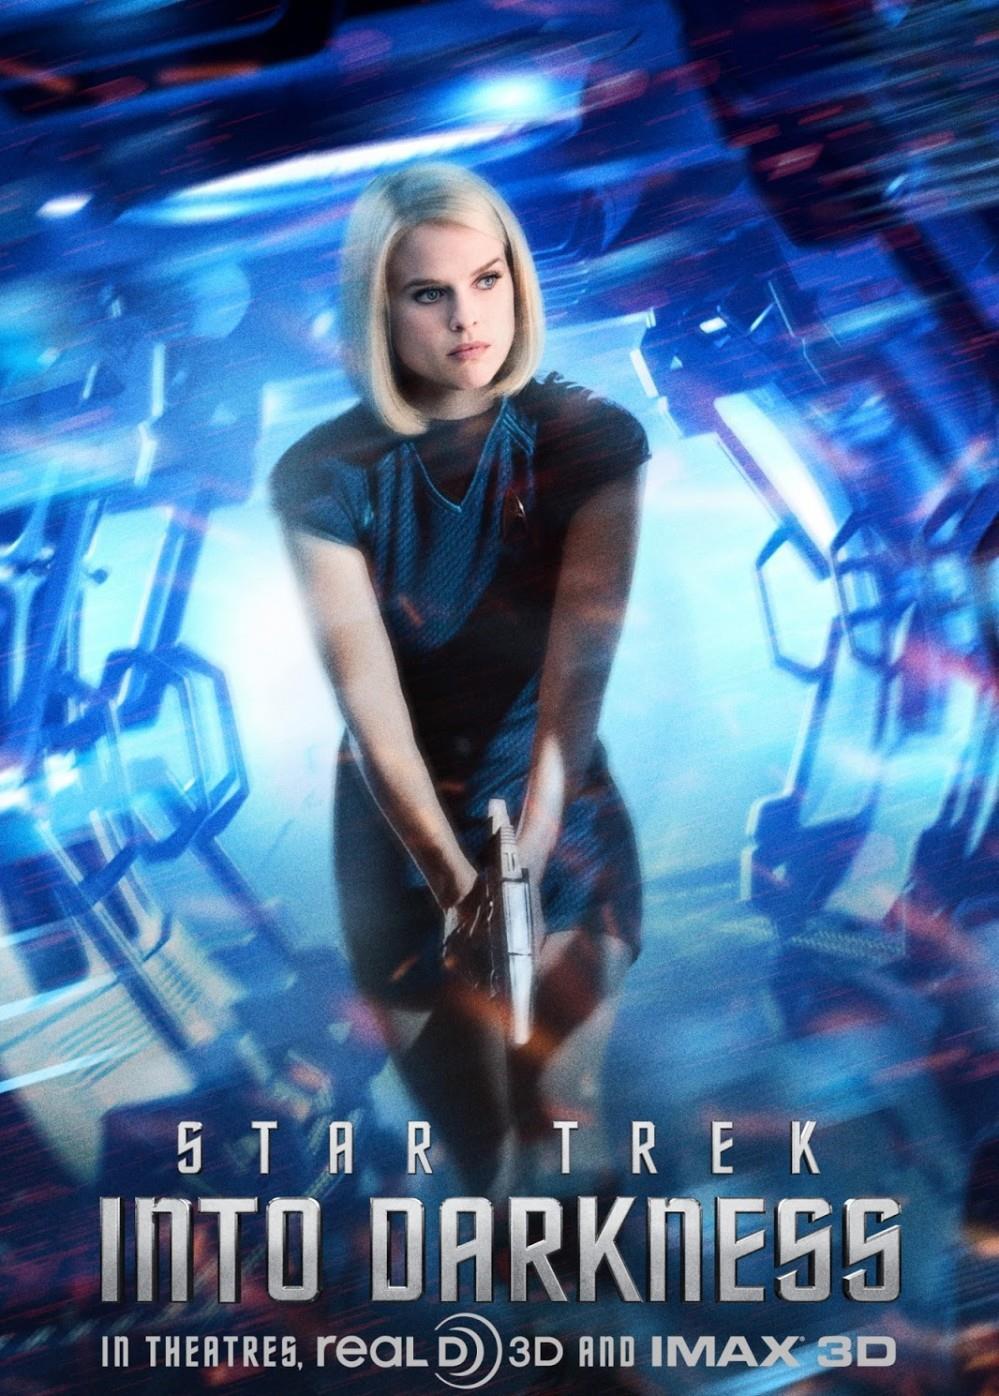 Star Trek Into Darkness - Movie Poster #10 (Original)